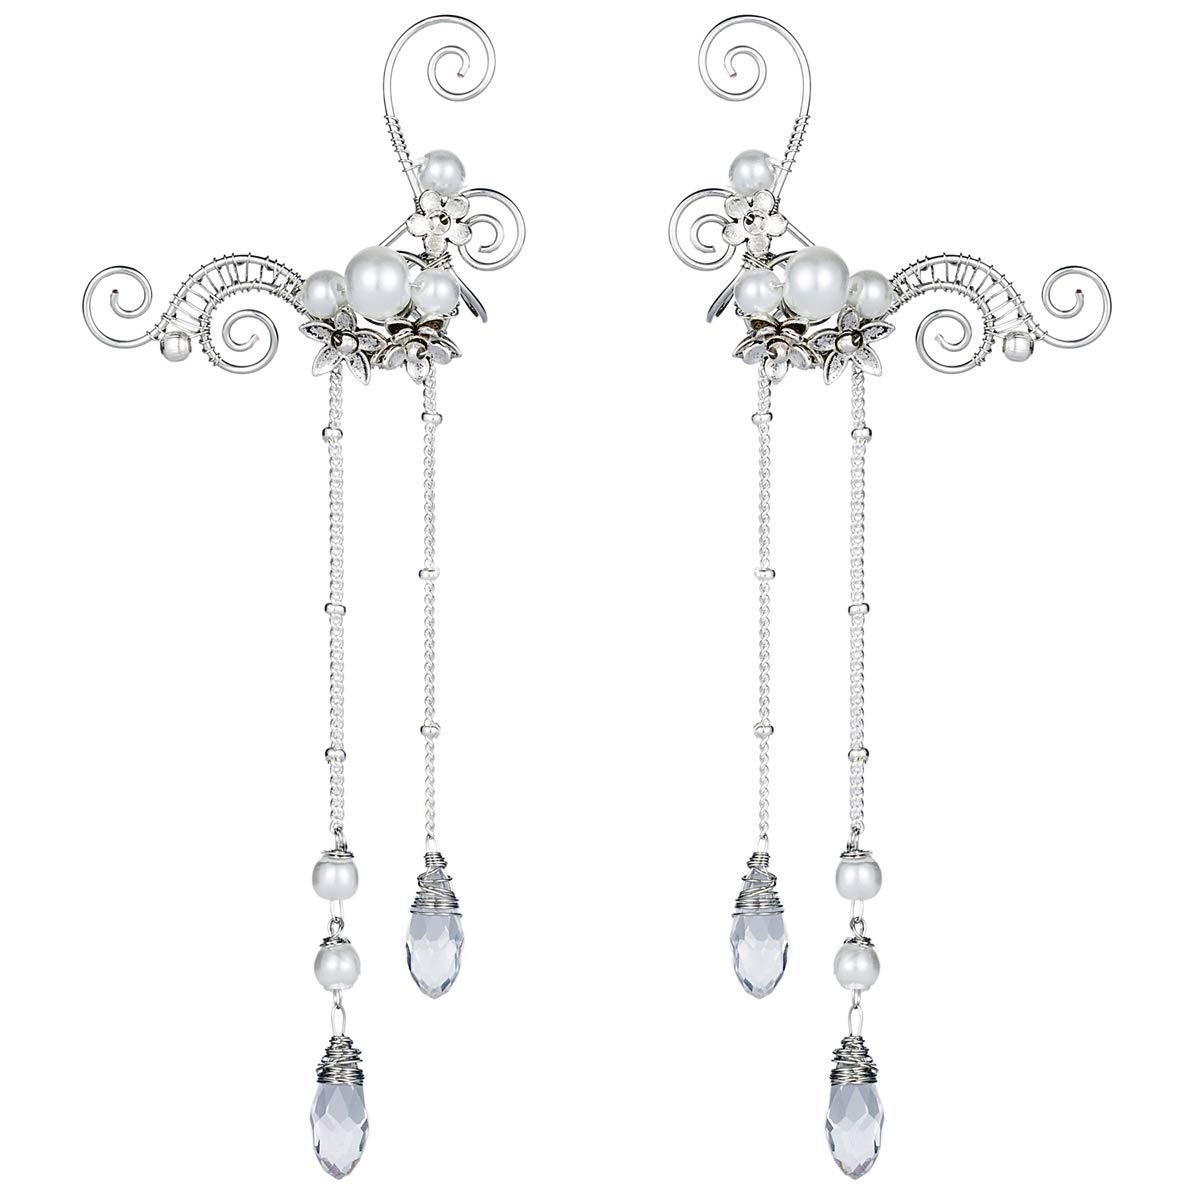 Aifeer Elf Elven Ear Cuffs, Non-Pierced Filigree Wrap Earrings Ear Cuffs for Women Bridal Wedding Handcraft Flowers Jewelry Threader Tassel Chain (White) by Aifeer